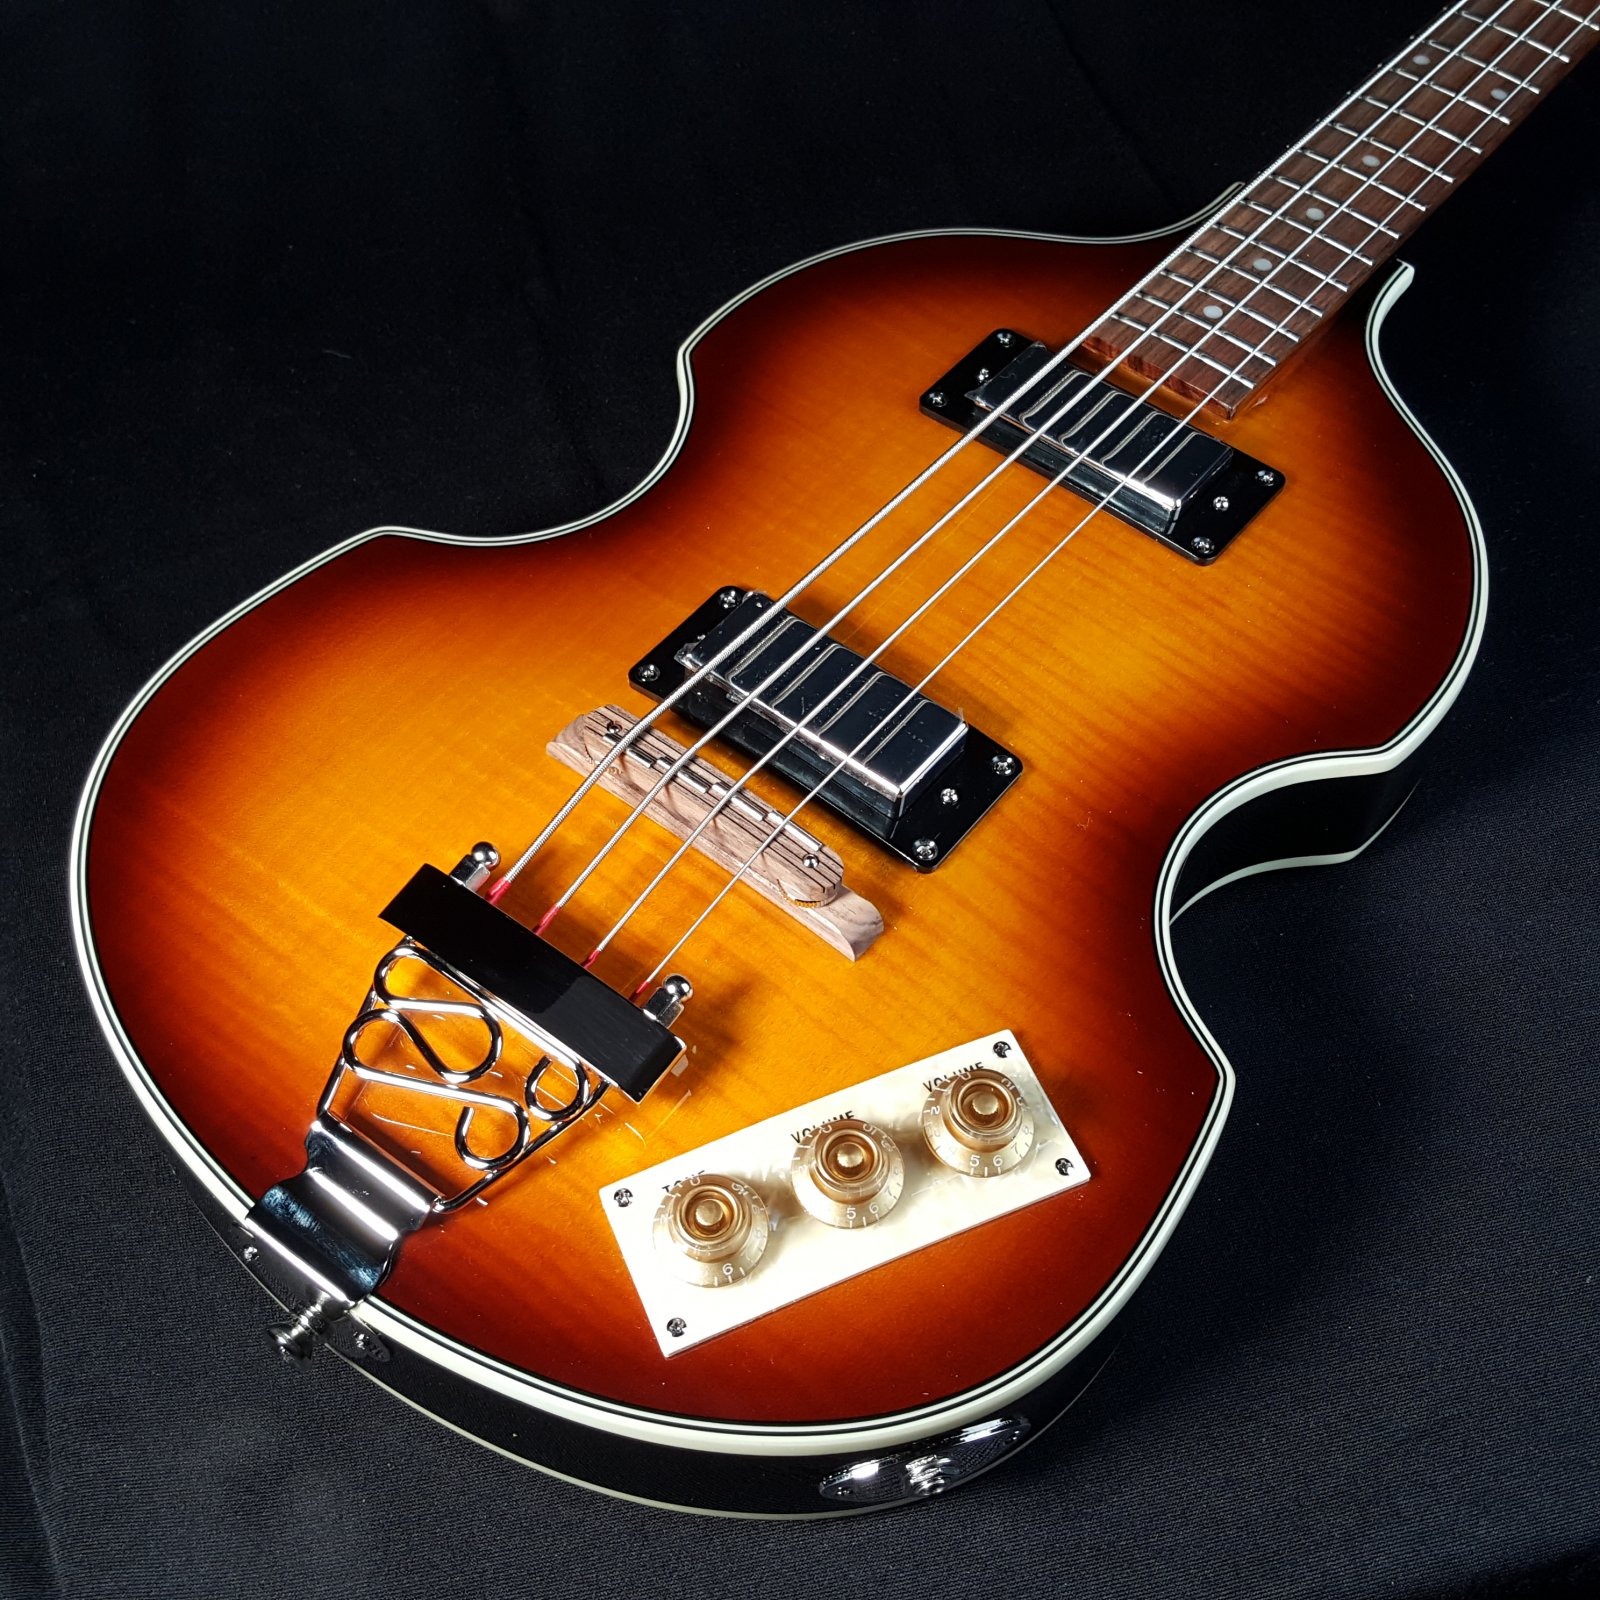 Epiphone Viola 4 String Semi Hollow Sunburst Bass